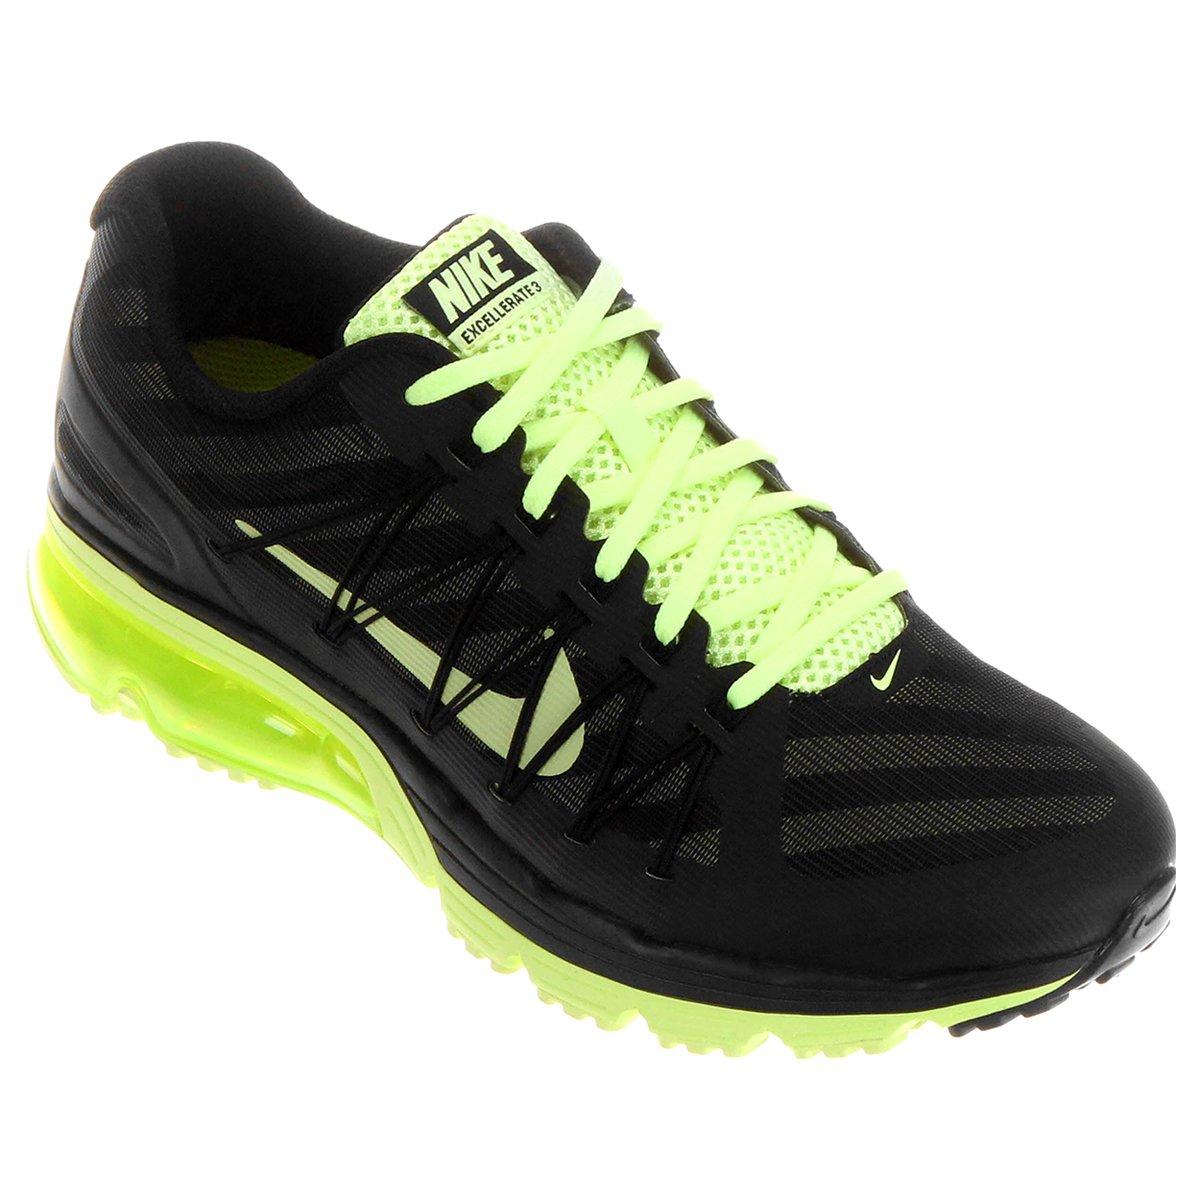 online store 1d30b 97e20 ... sweden tênis nike air max excellerate 3 nr preto e verde limo . 3edb5  09c20